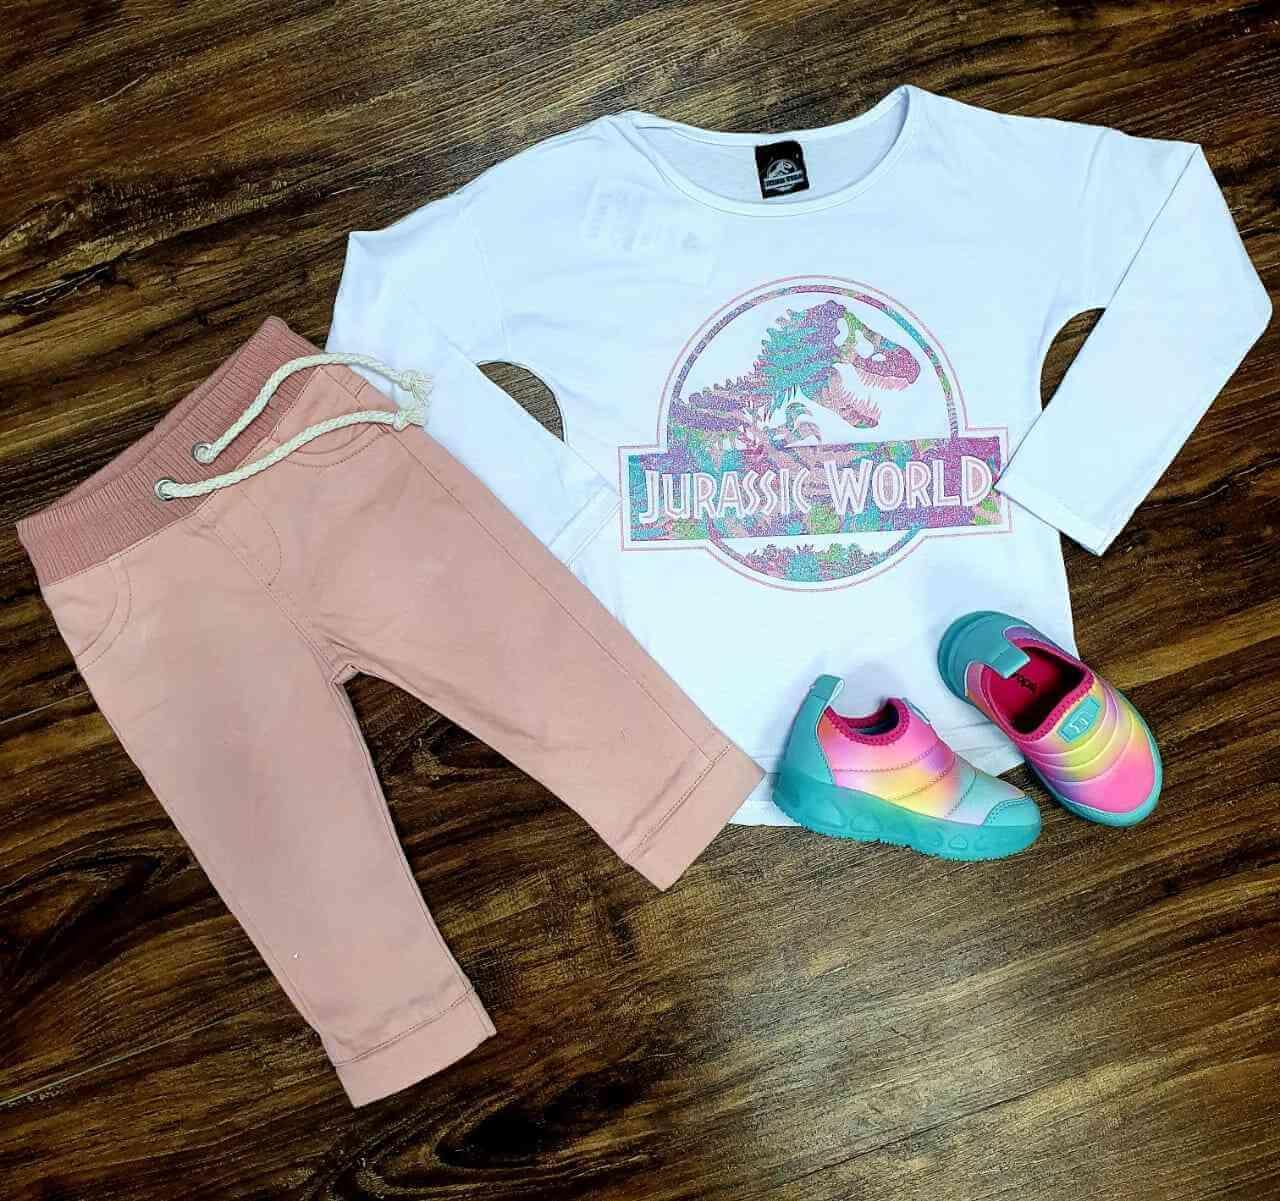 Blusa Jurassic World com Calça Jogger Infantil